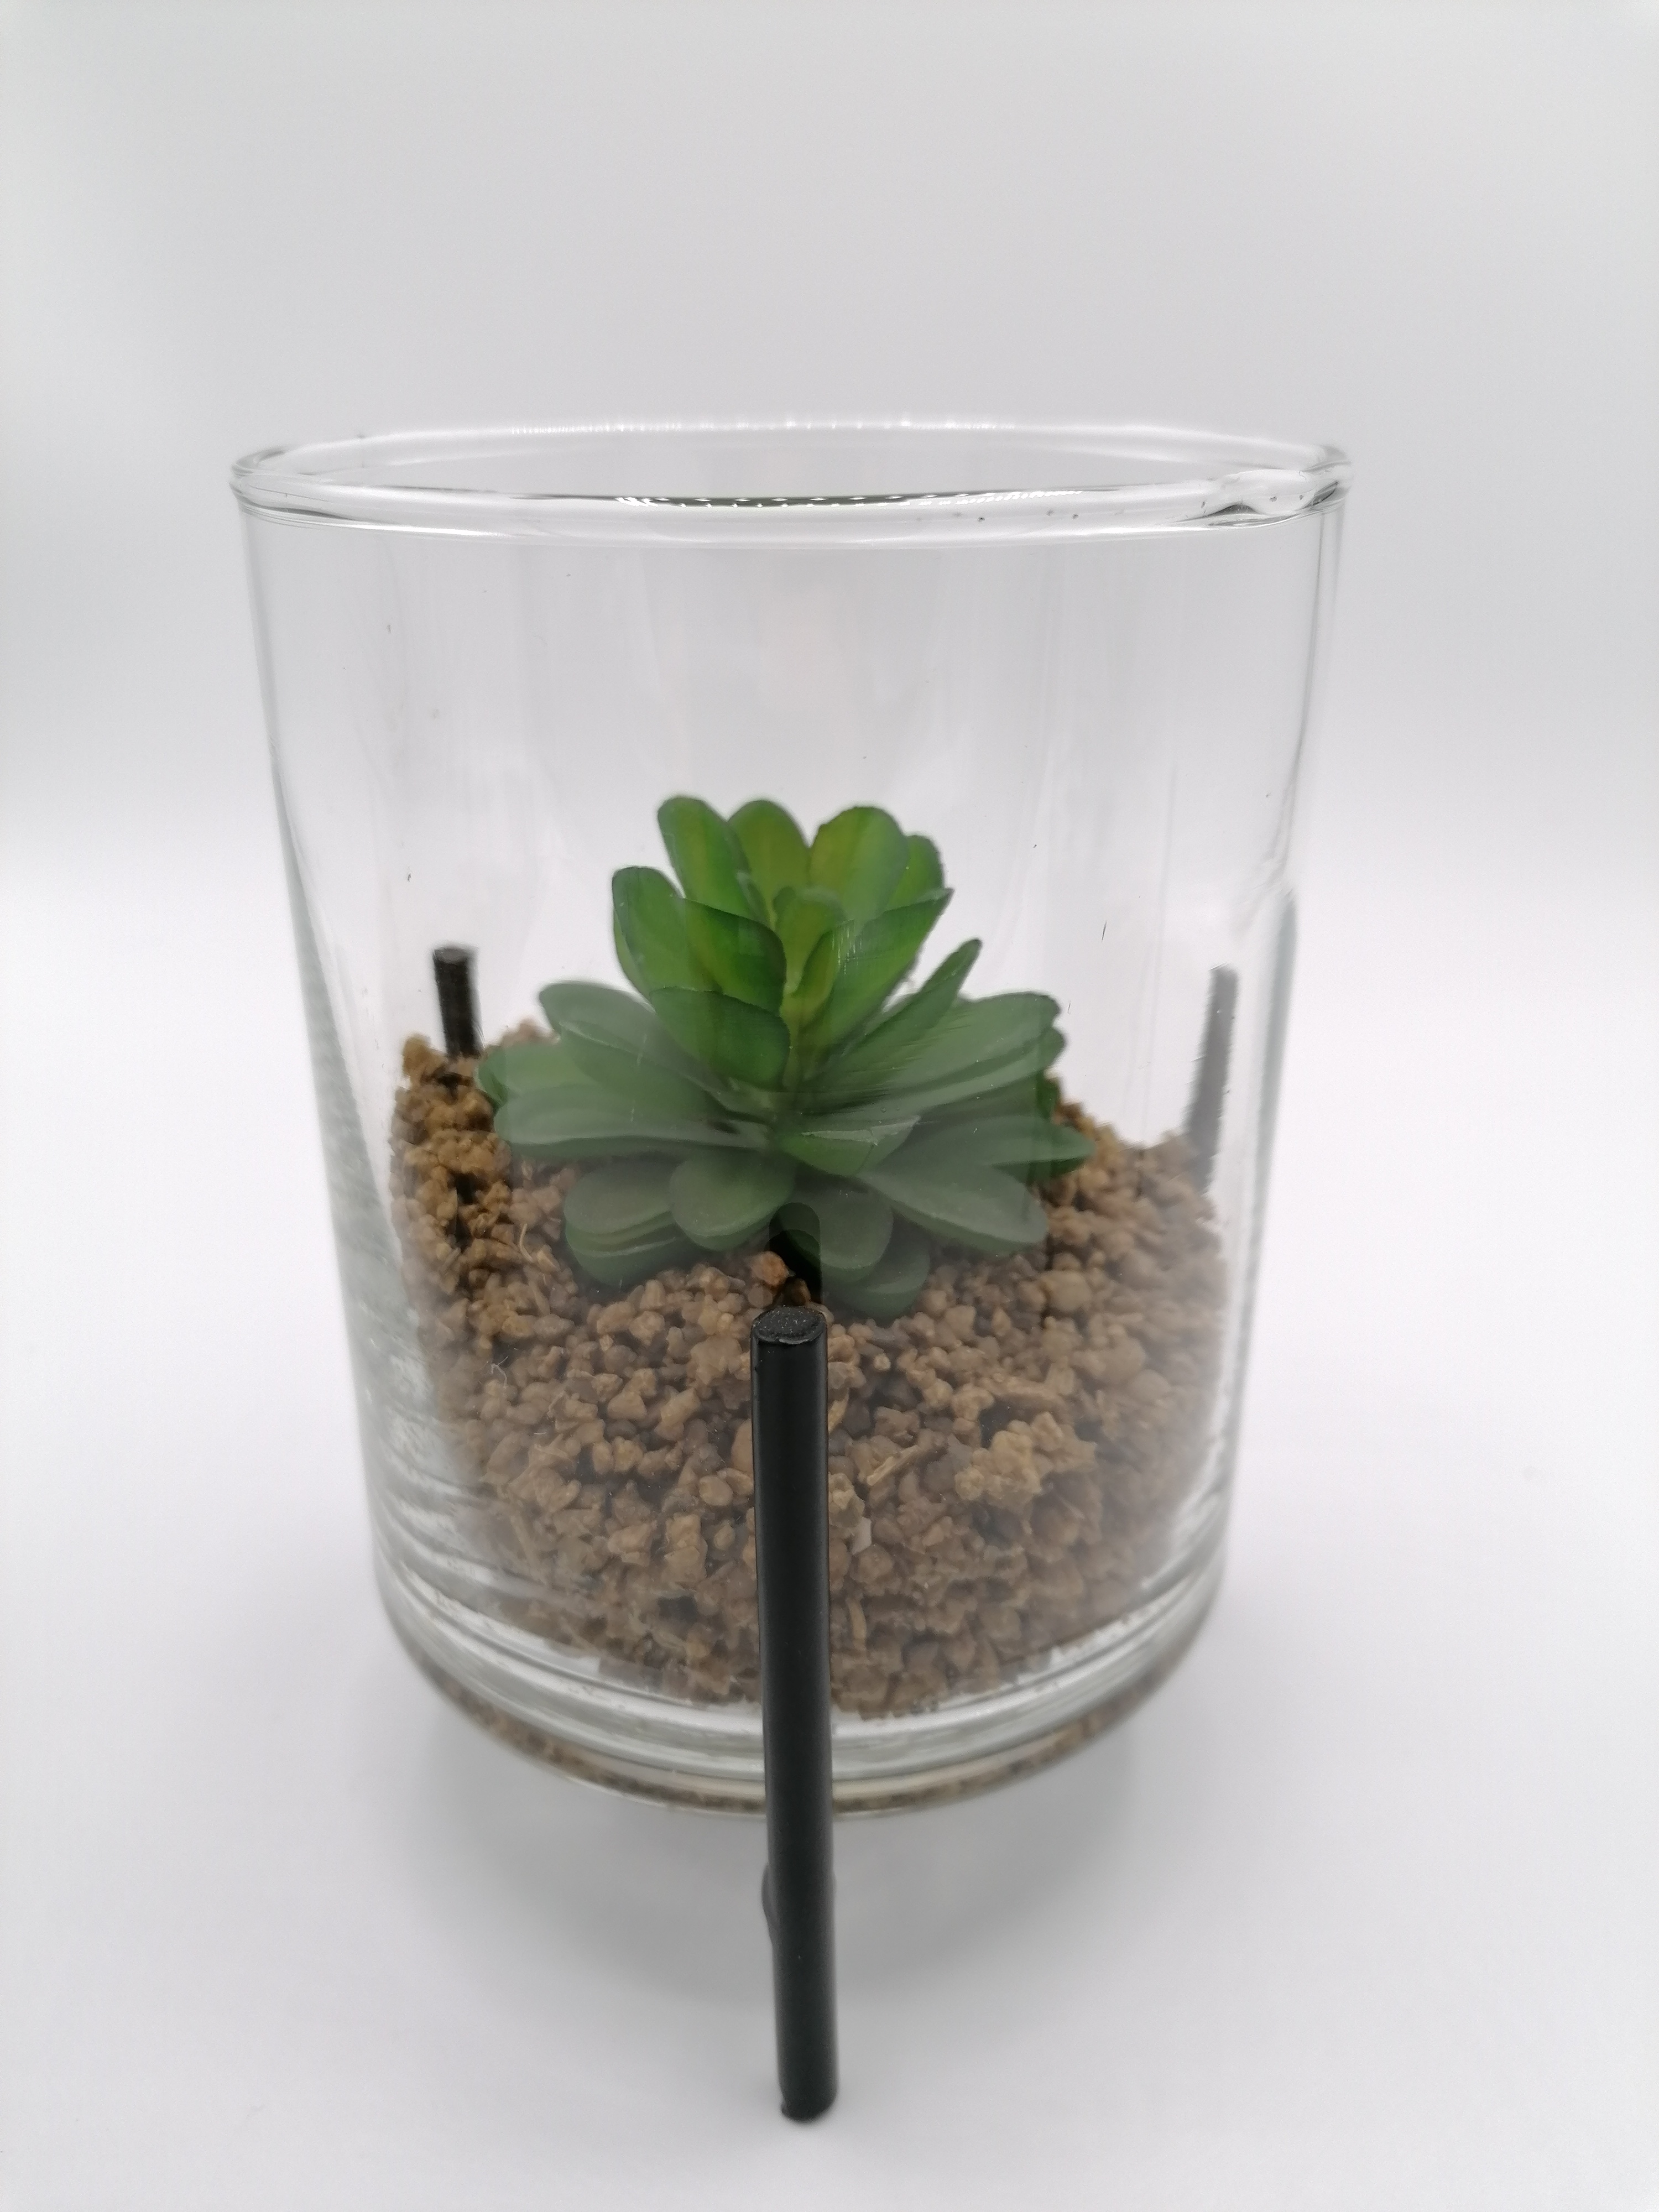 Metallgestell mit Kunstpflanze